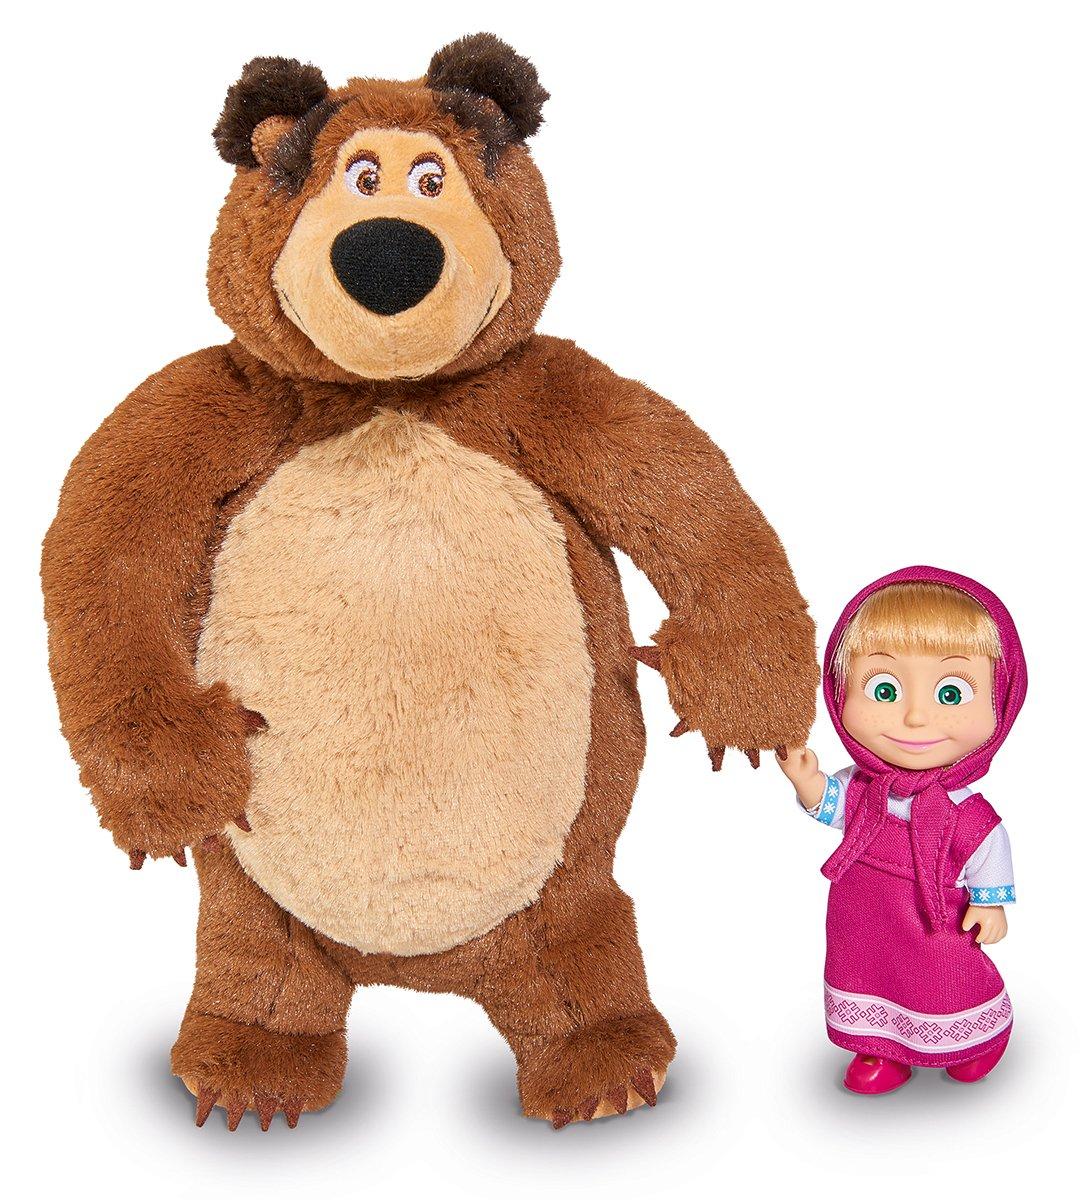 Simba 109301002 - Mascha und Der Bär Set Plüschbär + Puppe, Klein Simba Toys